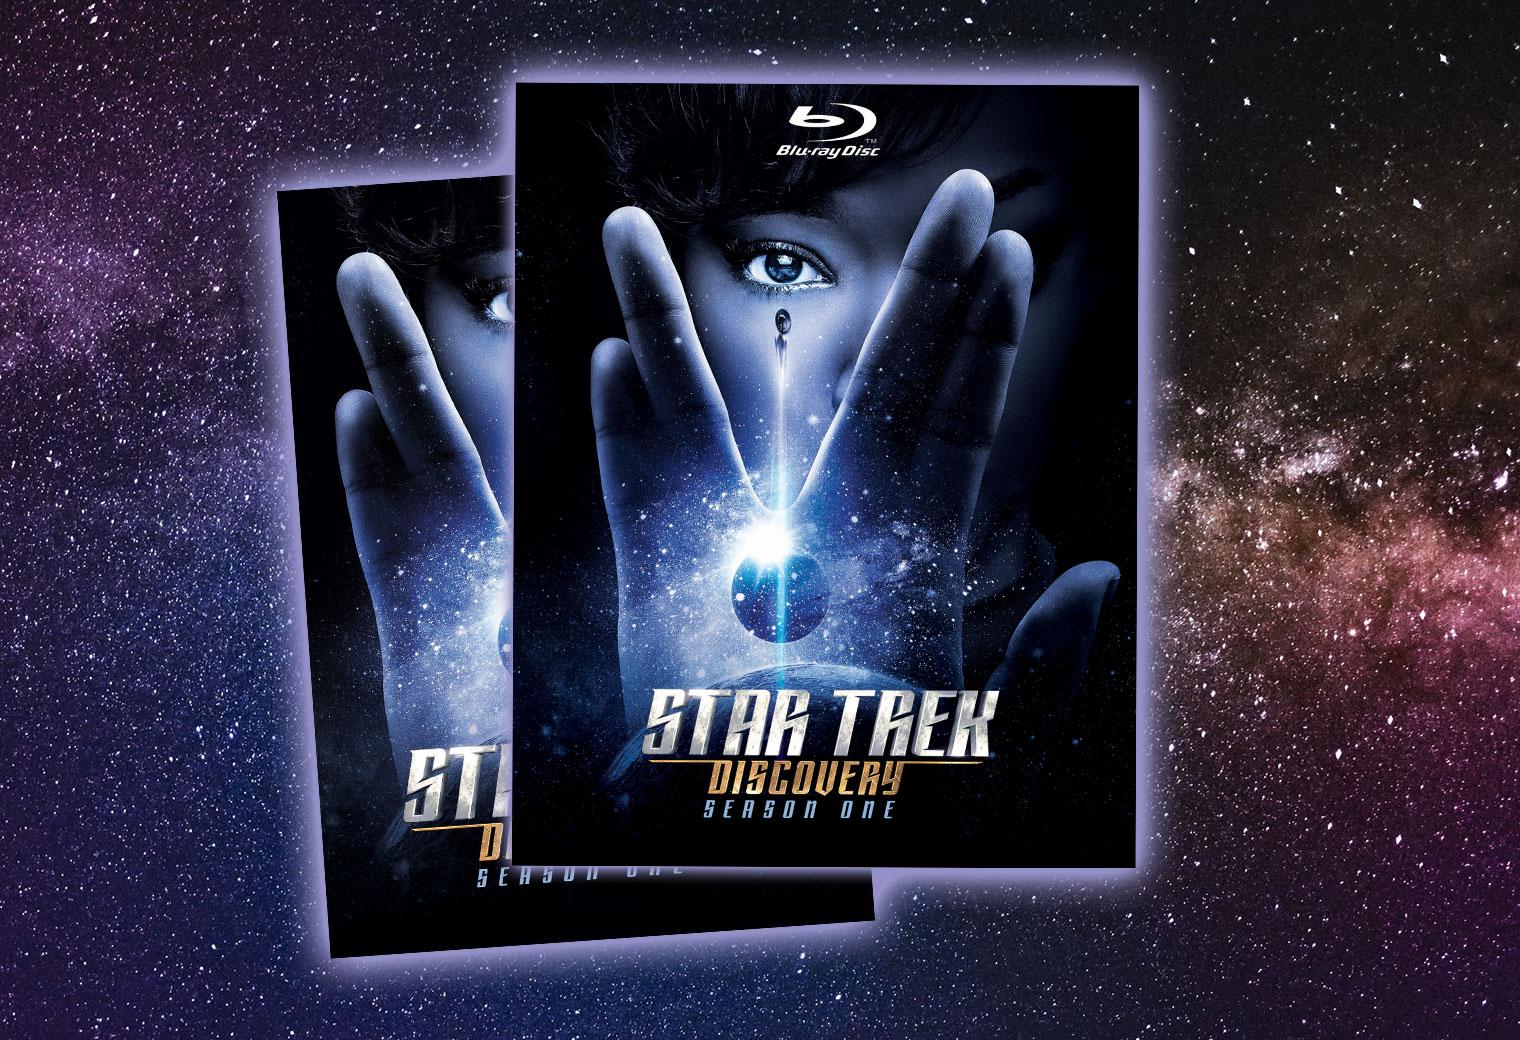 star trek discovery blu ray